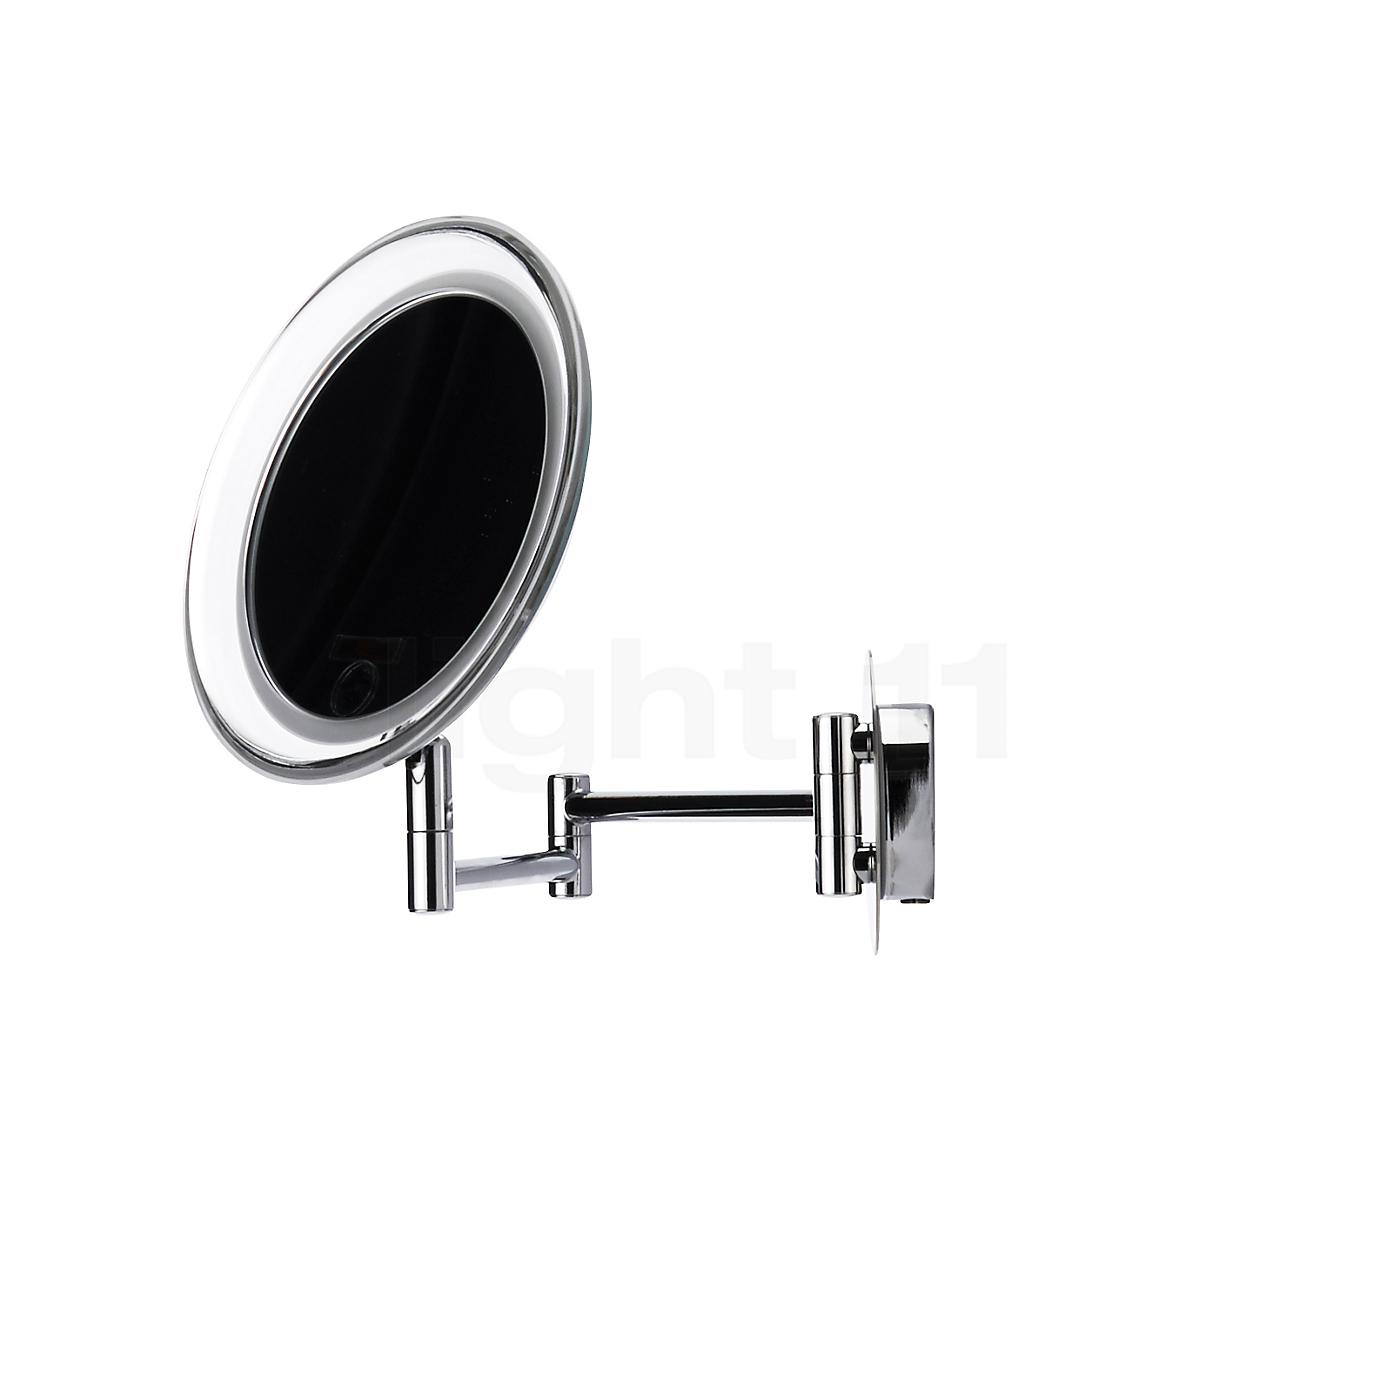 decor walther bs 16 wandkosmetikspiegel. Black Bedroom Furniture Sets. Home Design Ideas